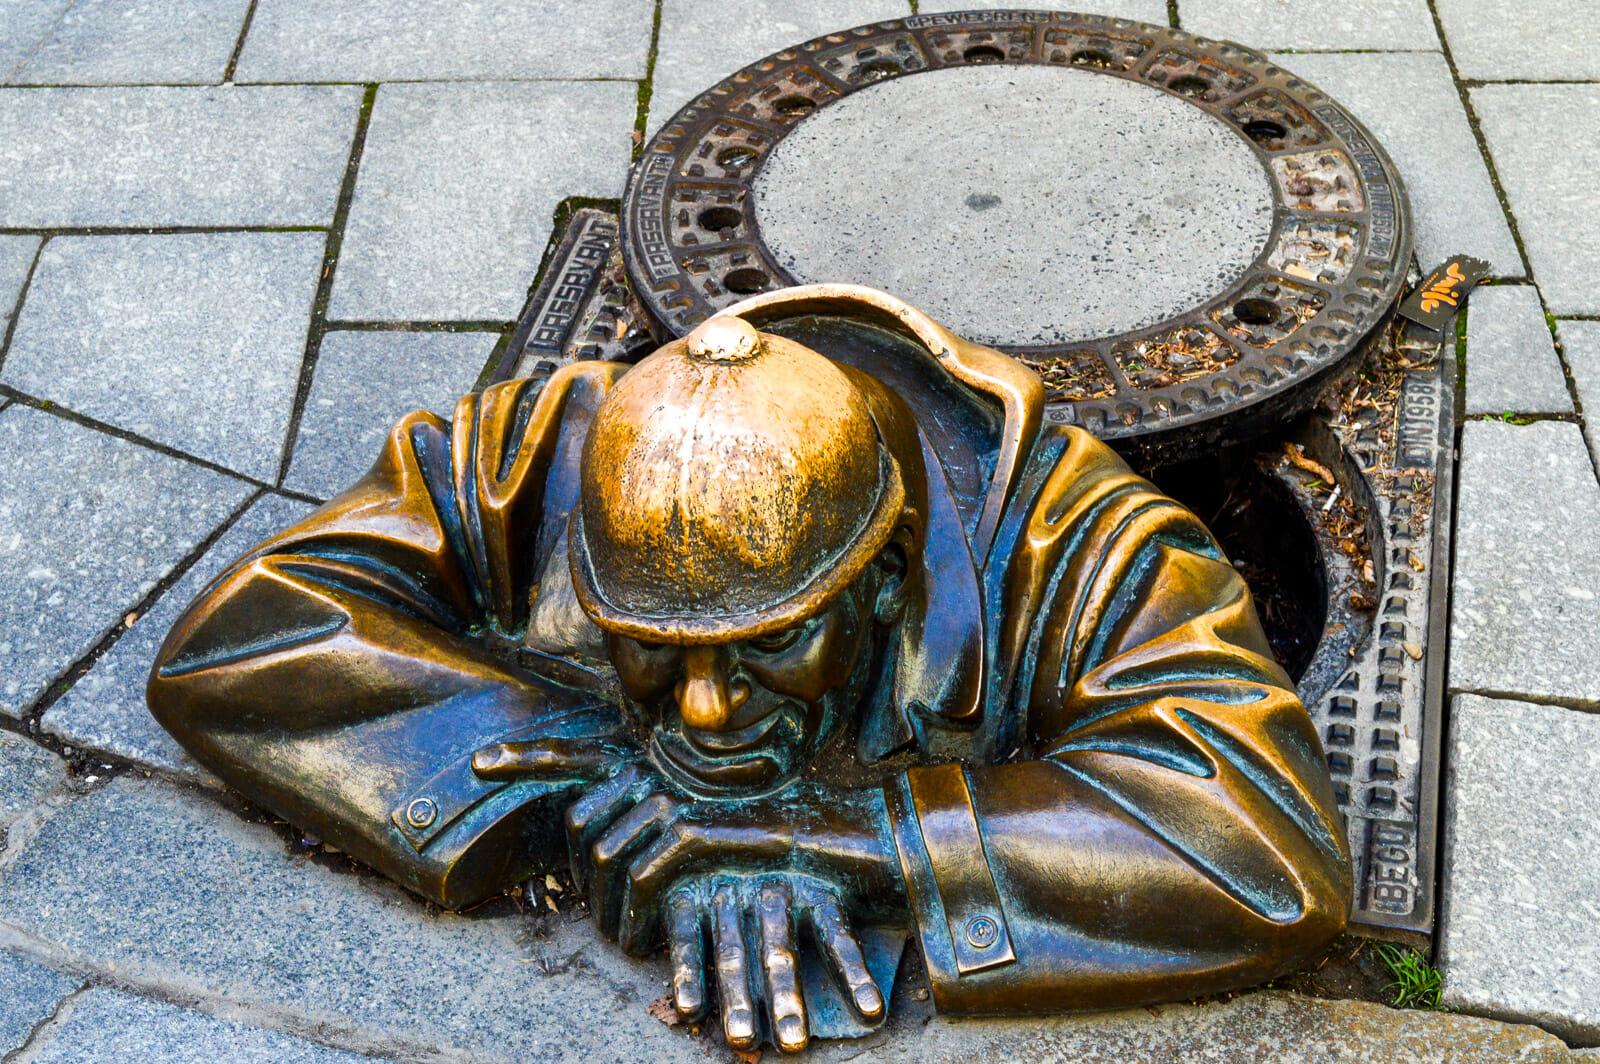 Sculptures of Bratislava, Slovakia